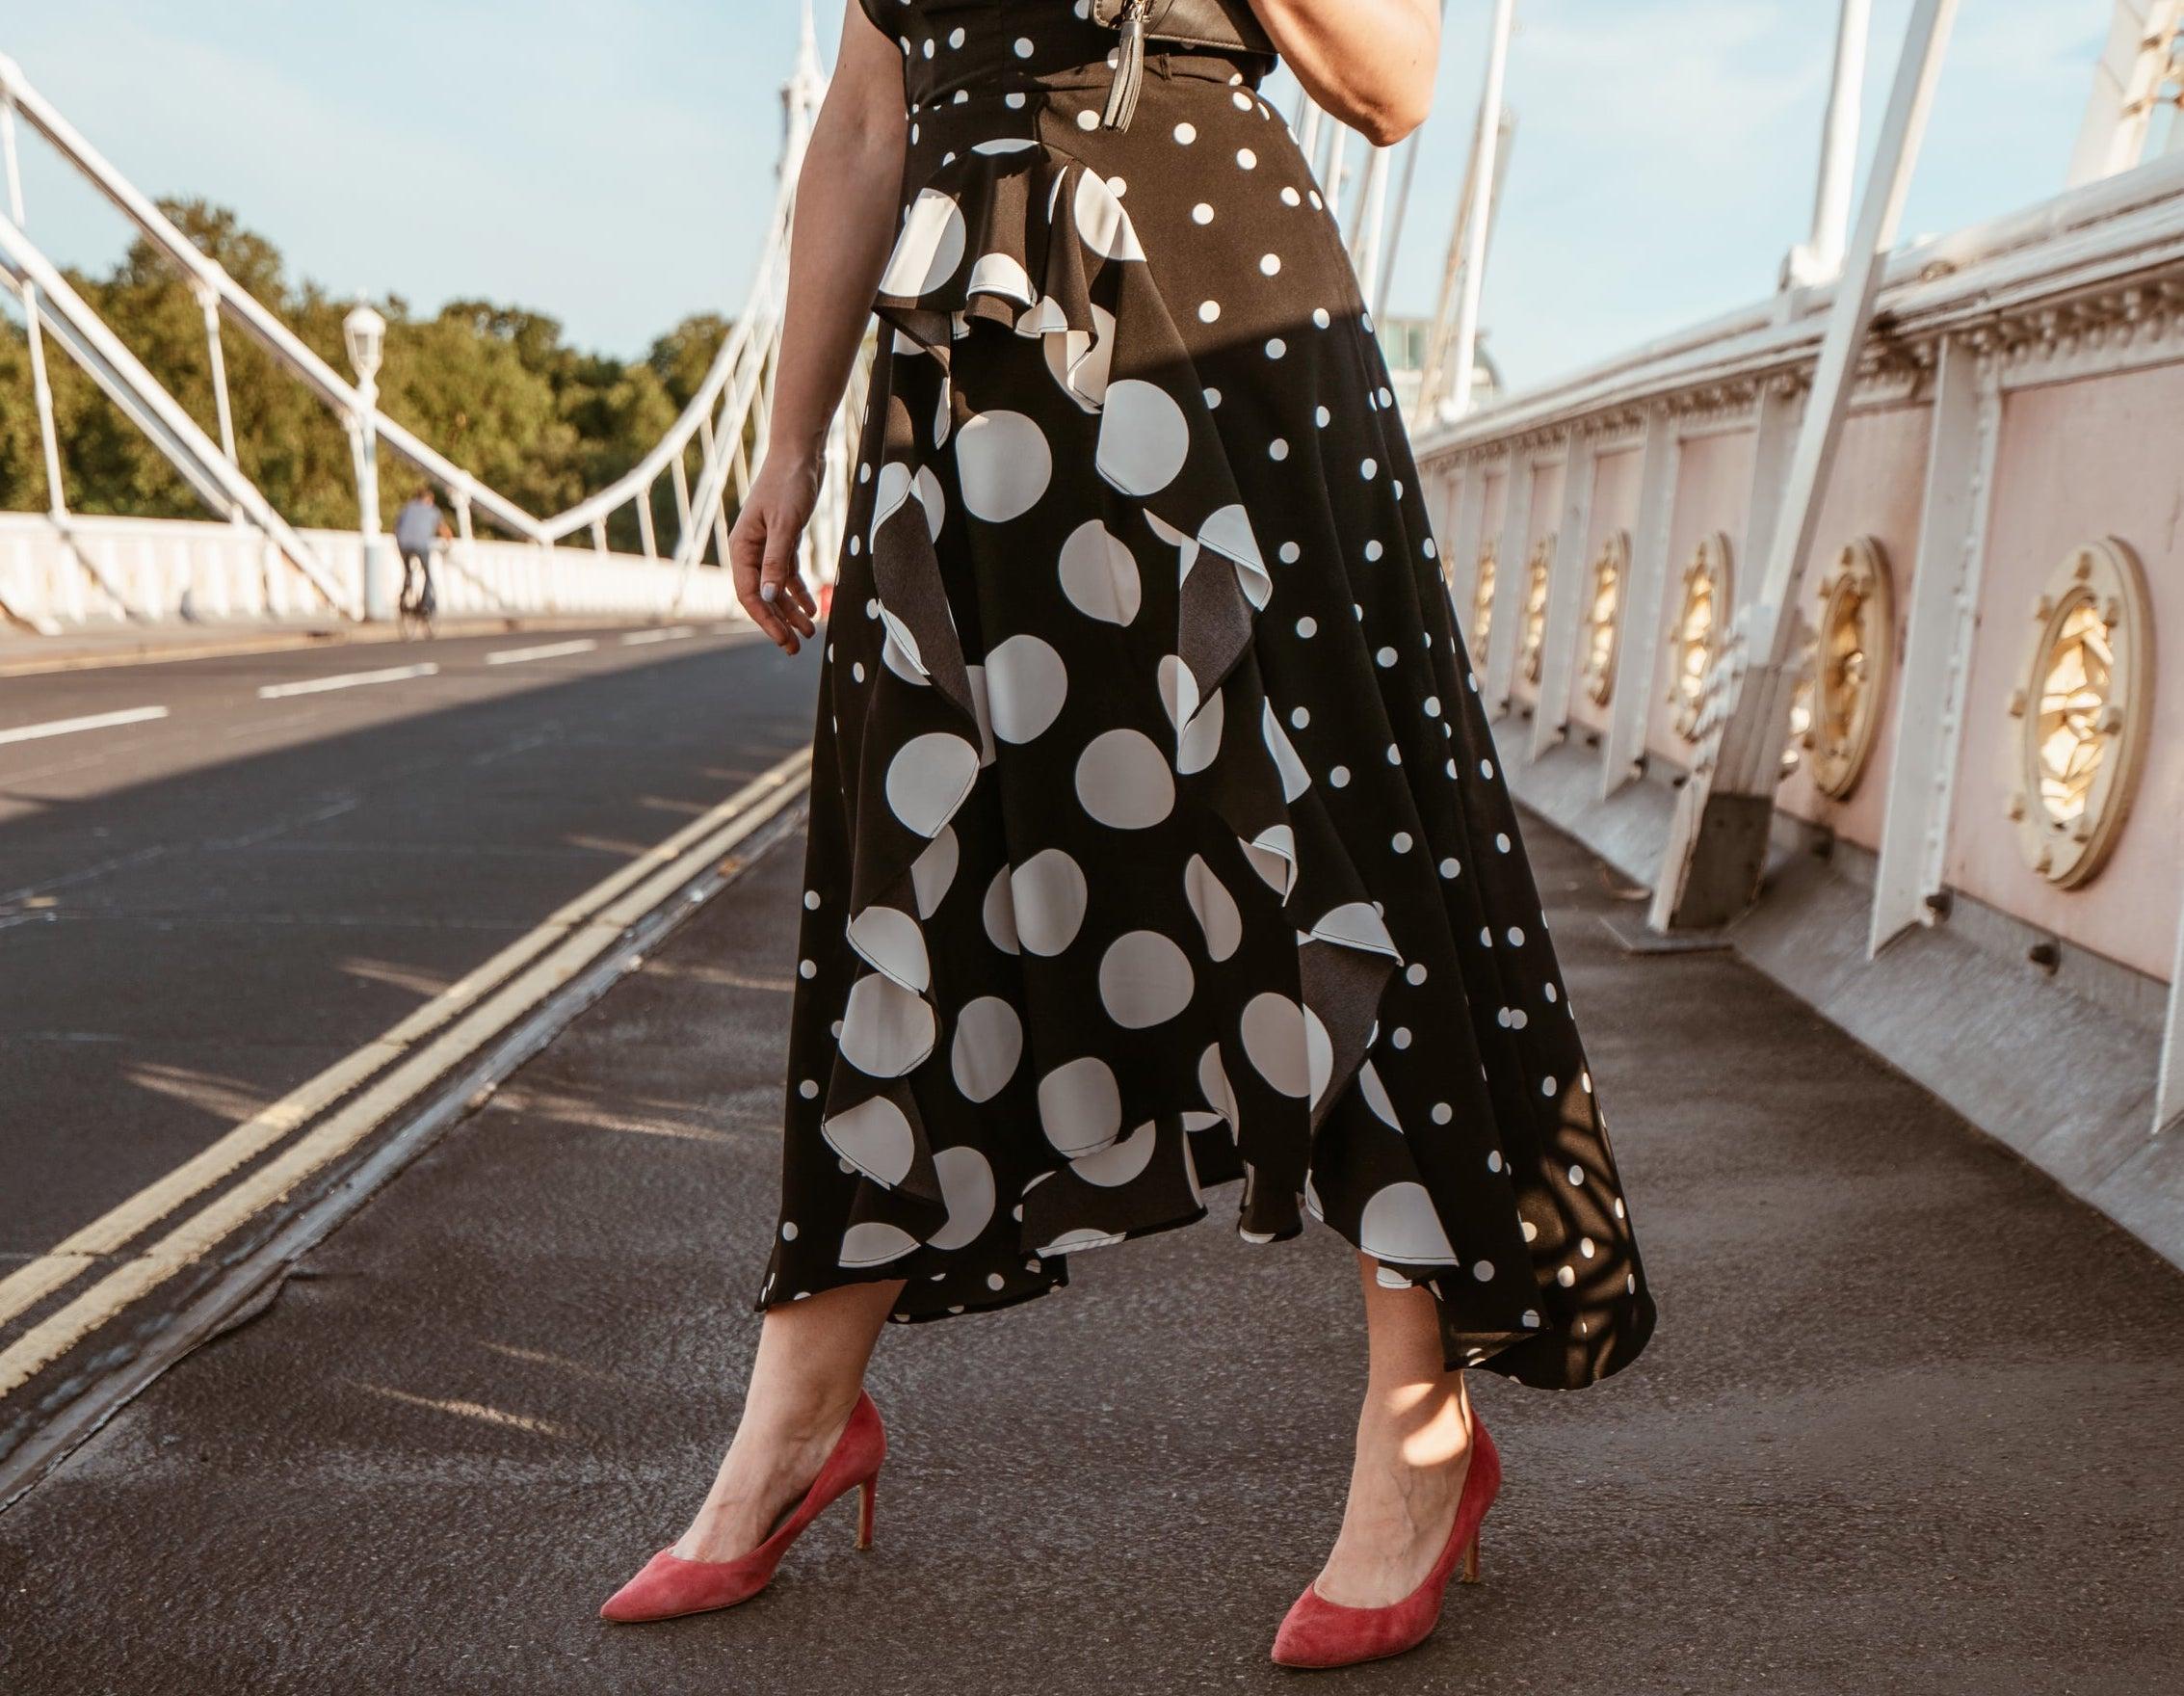 Marisa Oliveira from Arara Pintada wears Polka Dot Dress skirt detail Topshop